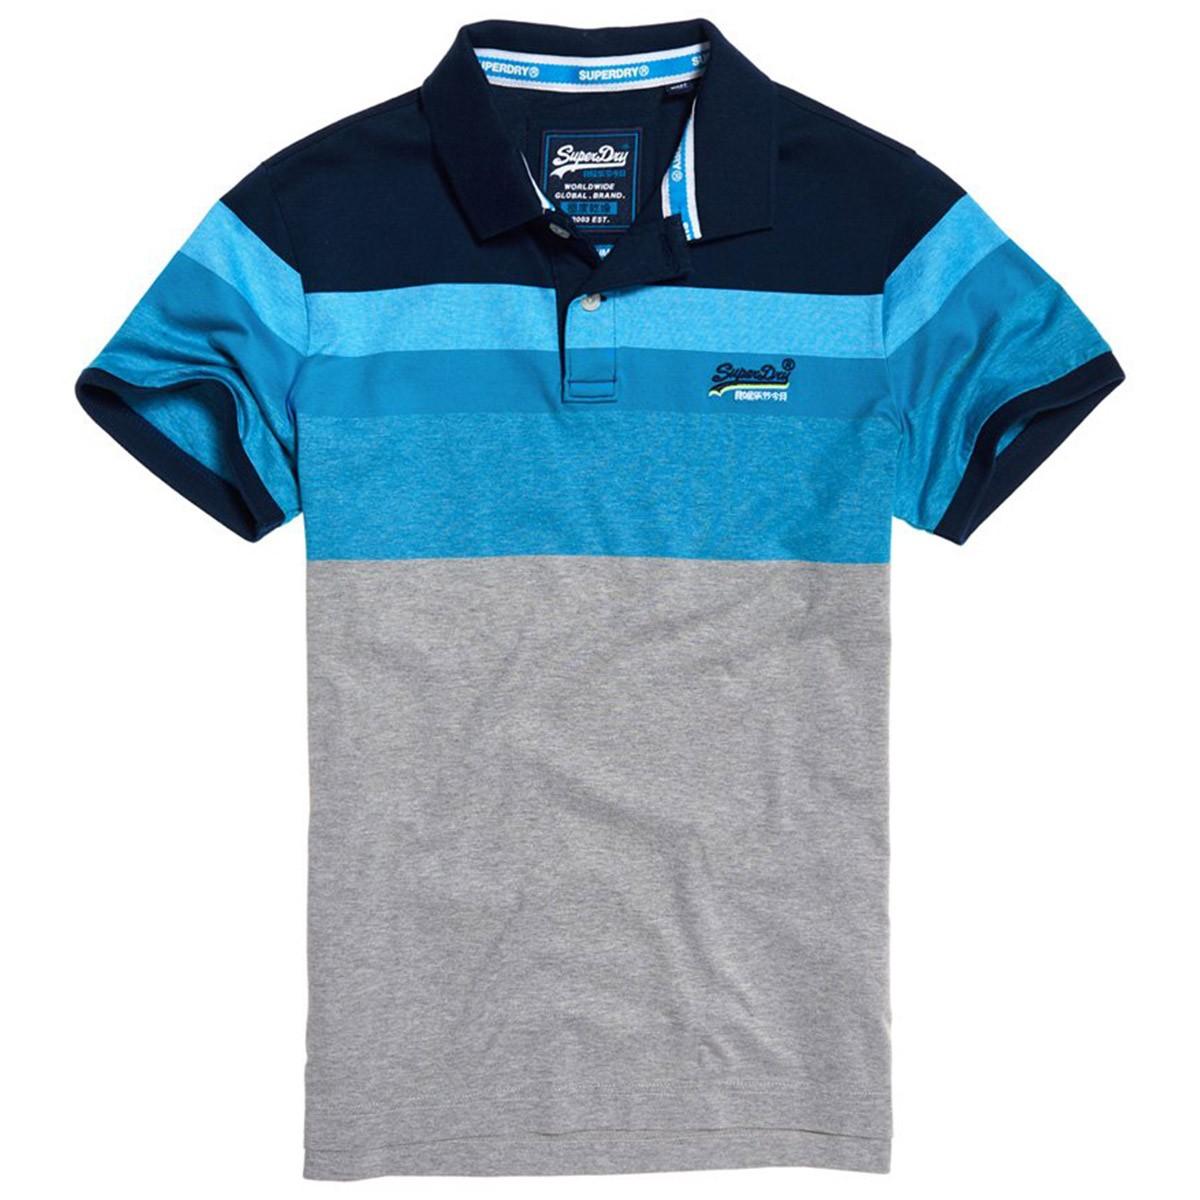 Superdry Miami Feeder Polo majica Spremna za leto: Evo gde možeš da pronađeš baš sve što ti je potrebno!